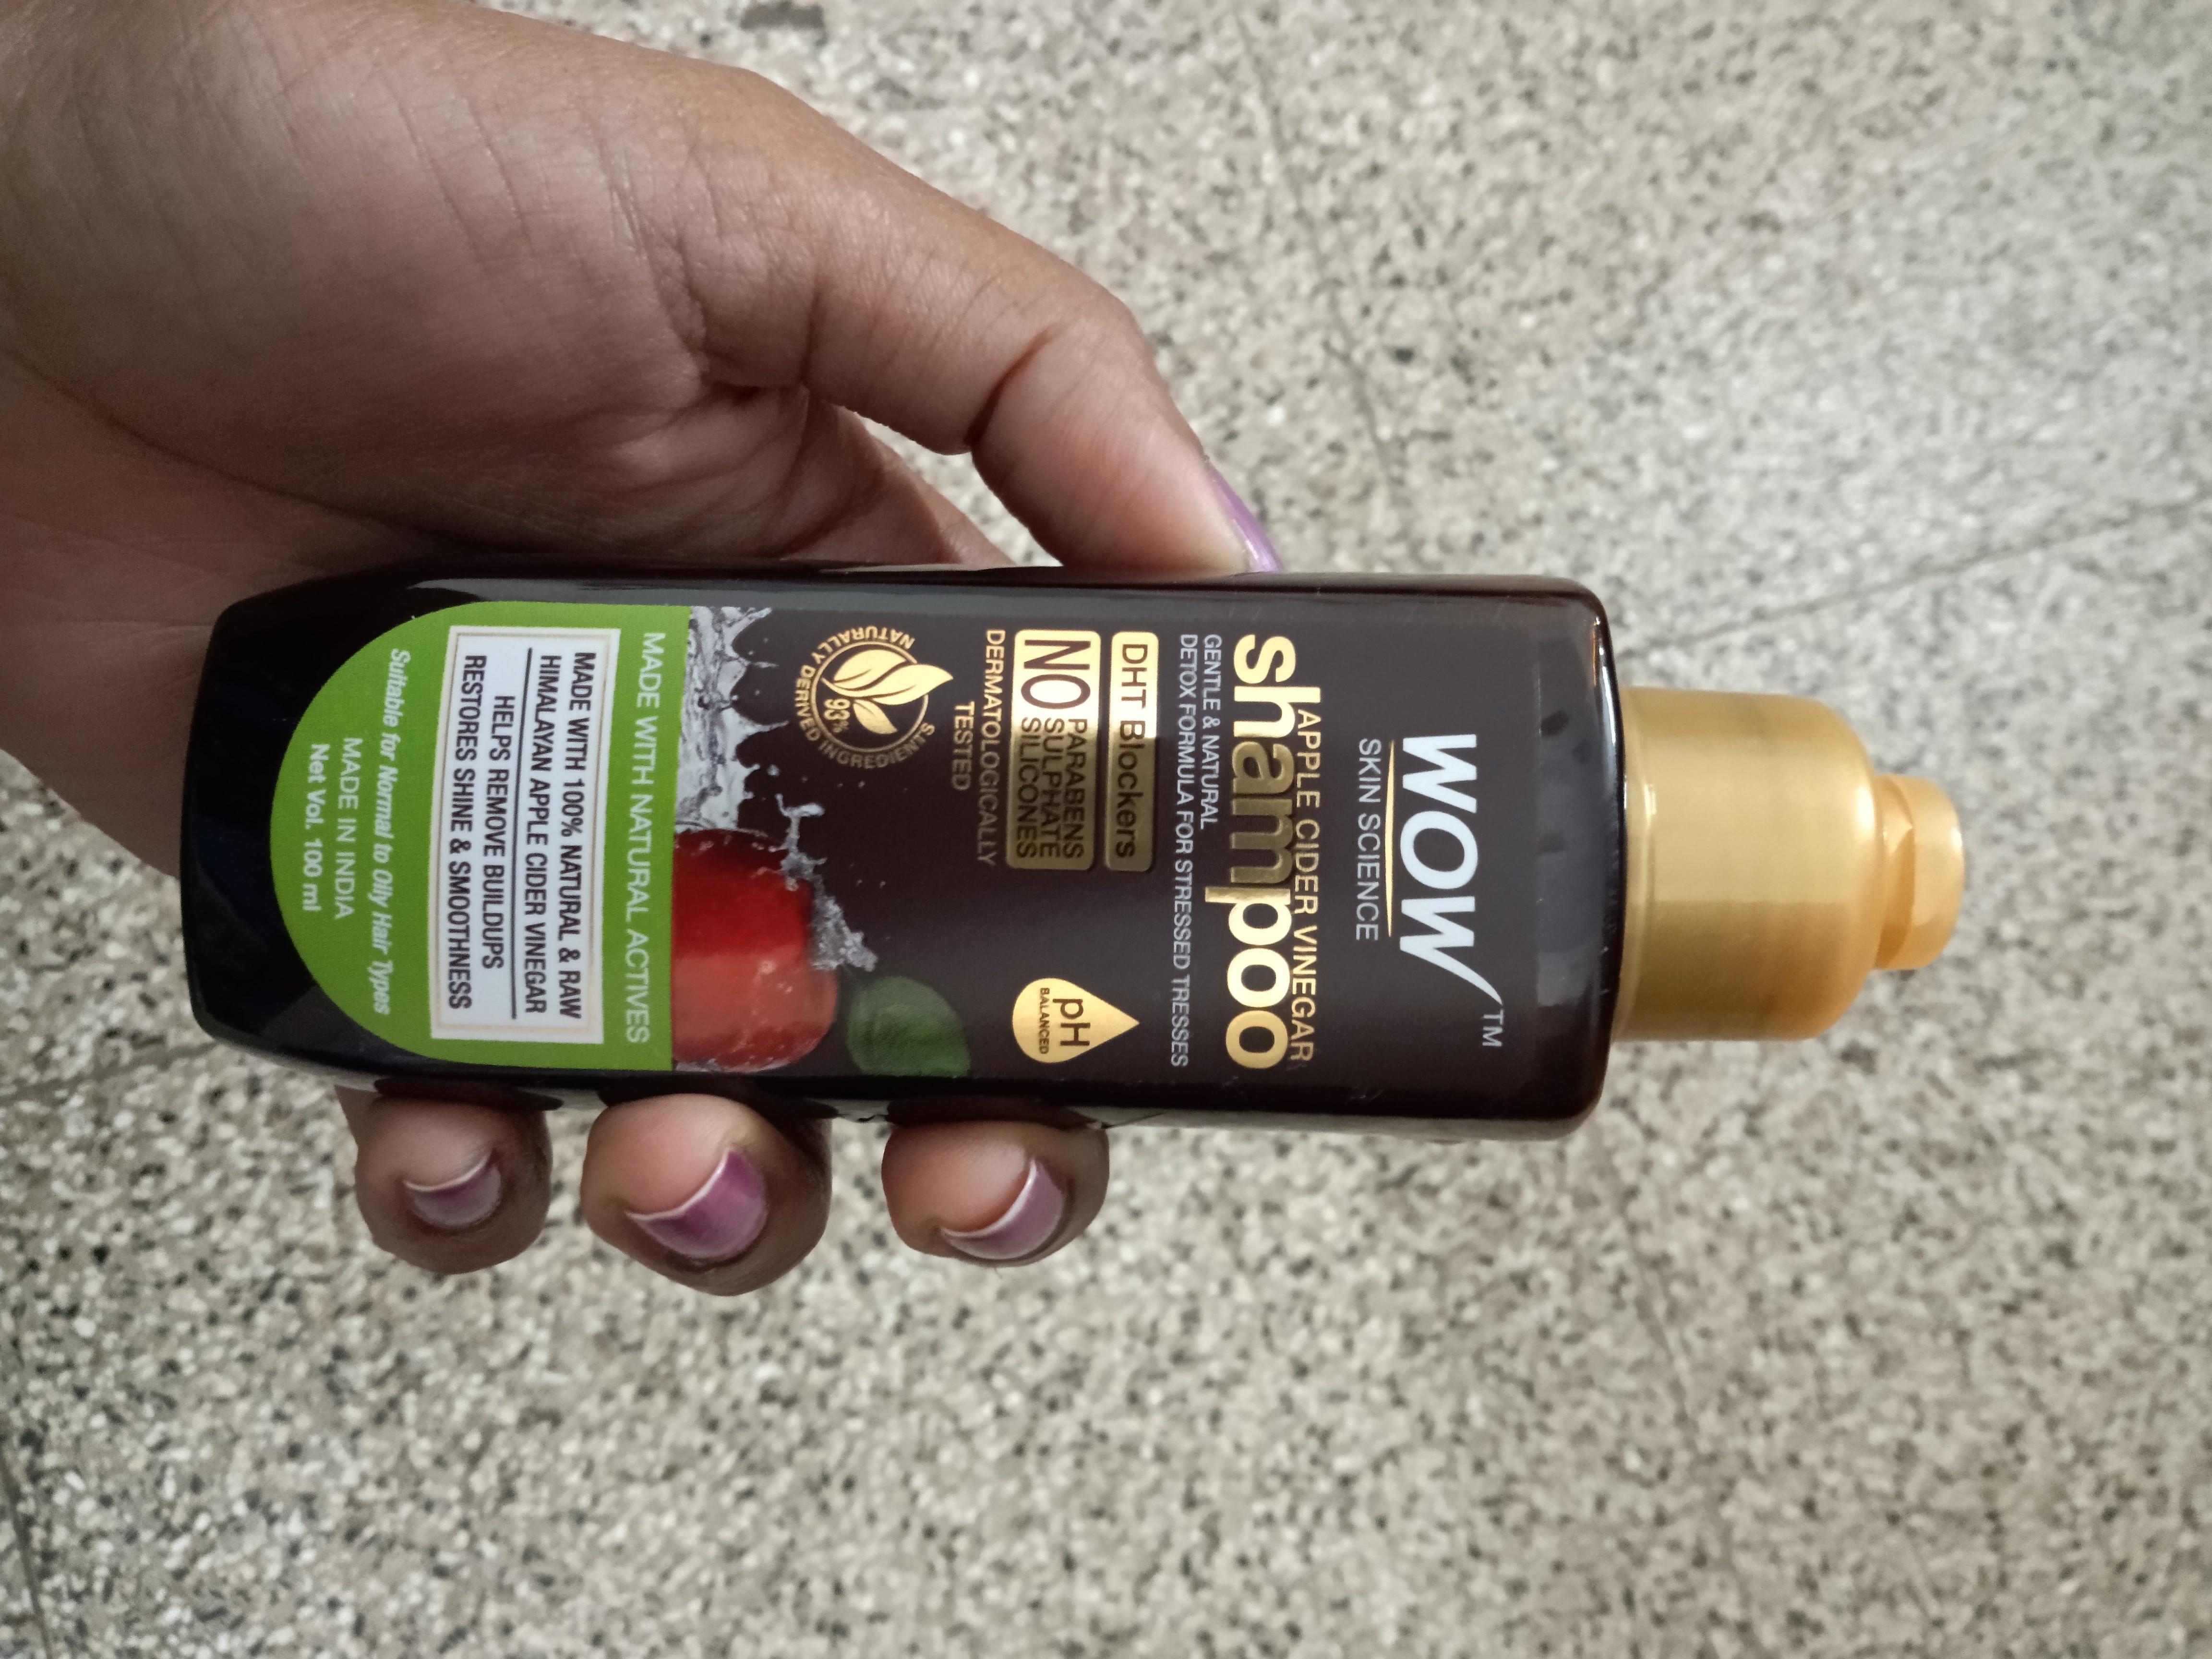 WOW Skin Science Apple Cider Vinegar Shampoo - No Parabens & Sulphate - 300 ml-Good one-By nattynatz